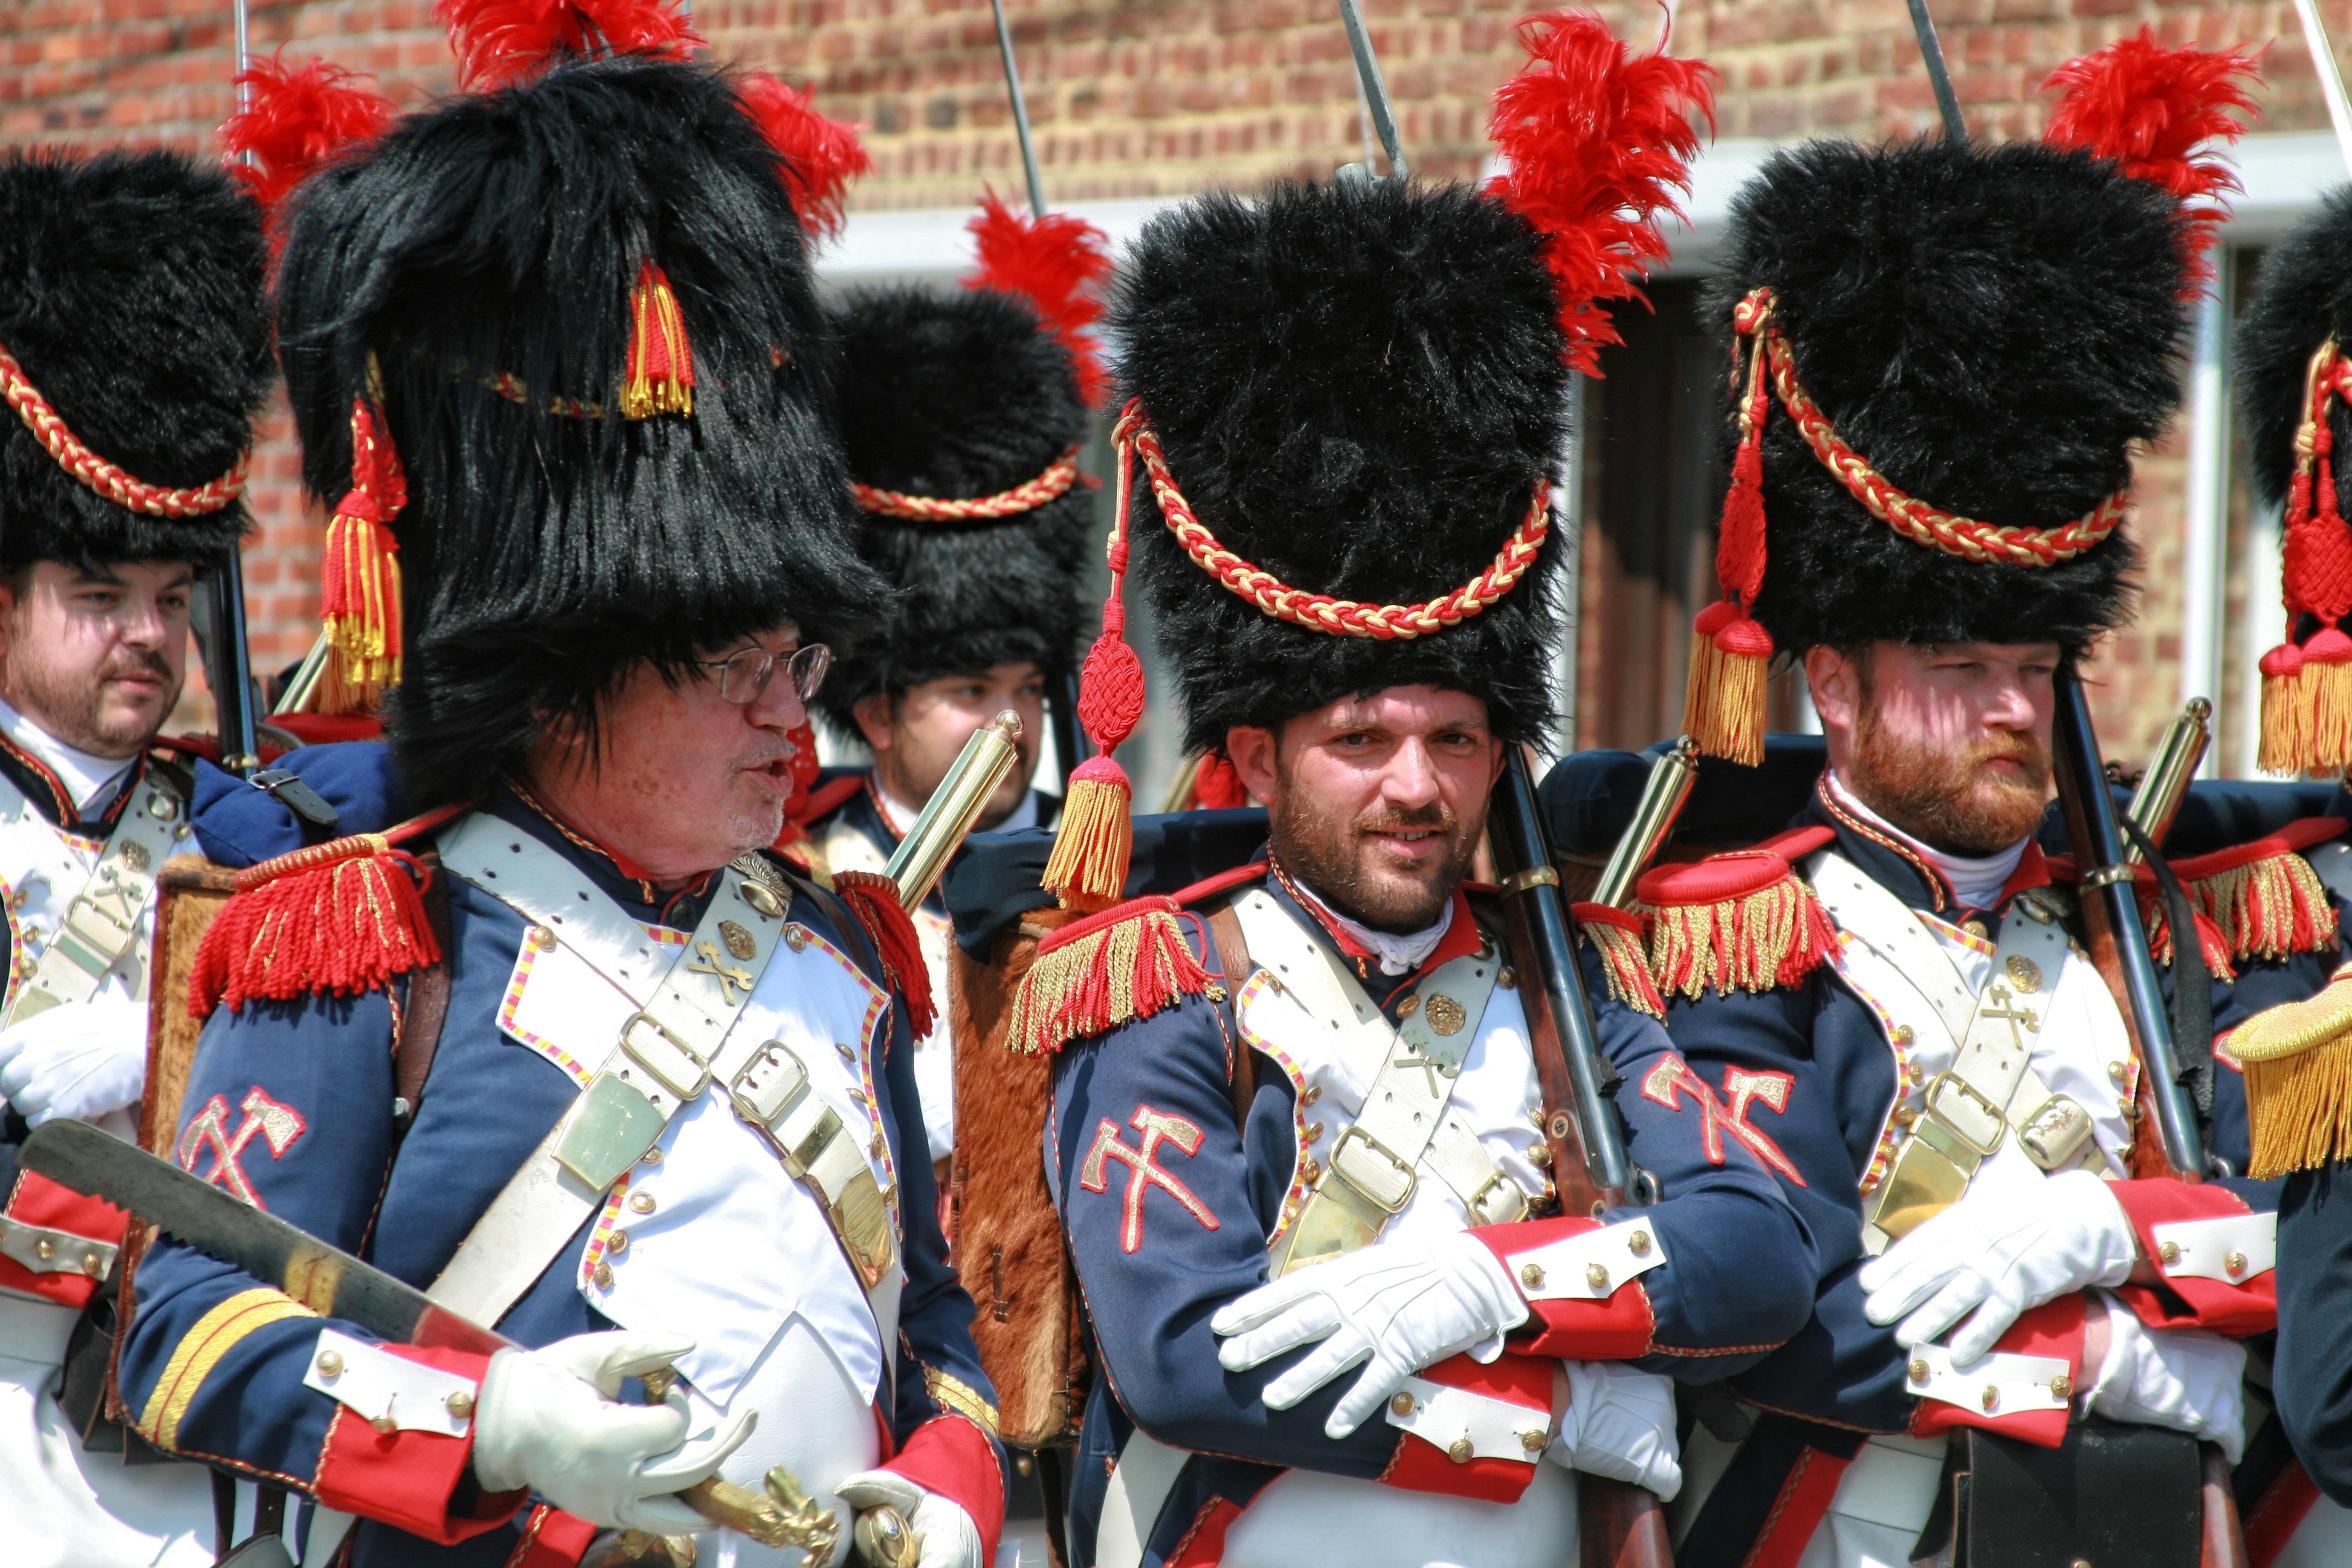 Costume Folklorique free images : person, people, carnival, belgium, festival, napoleon